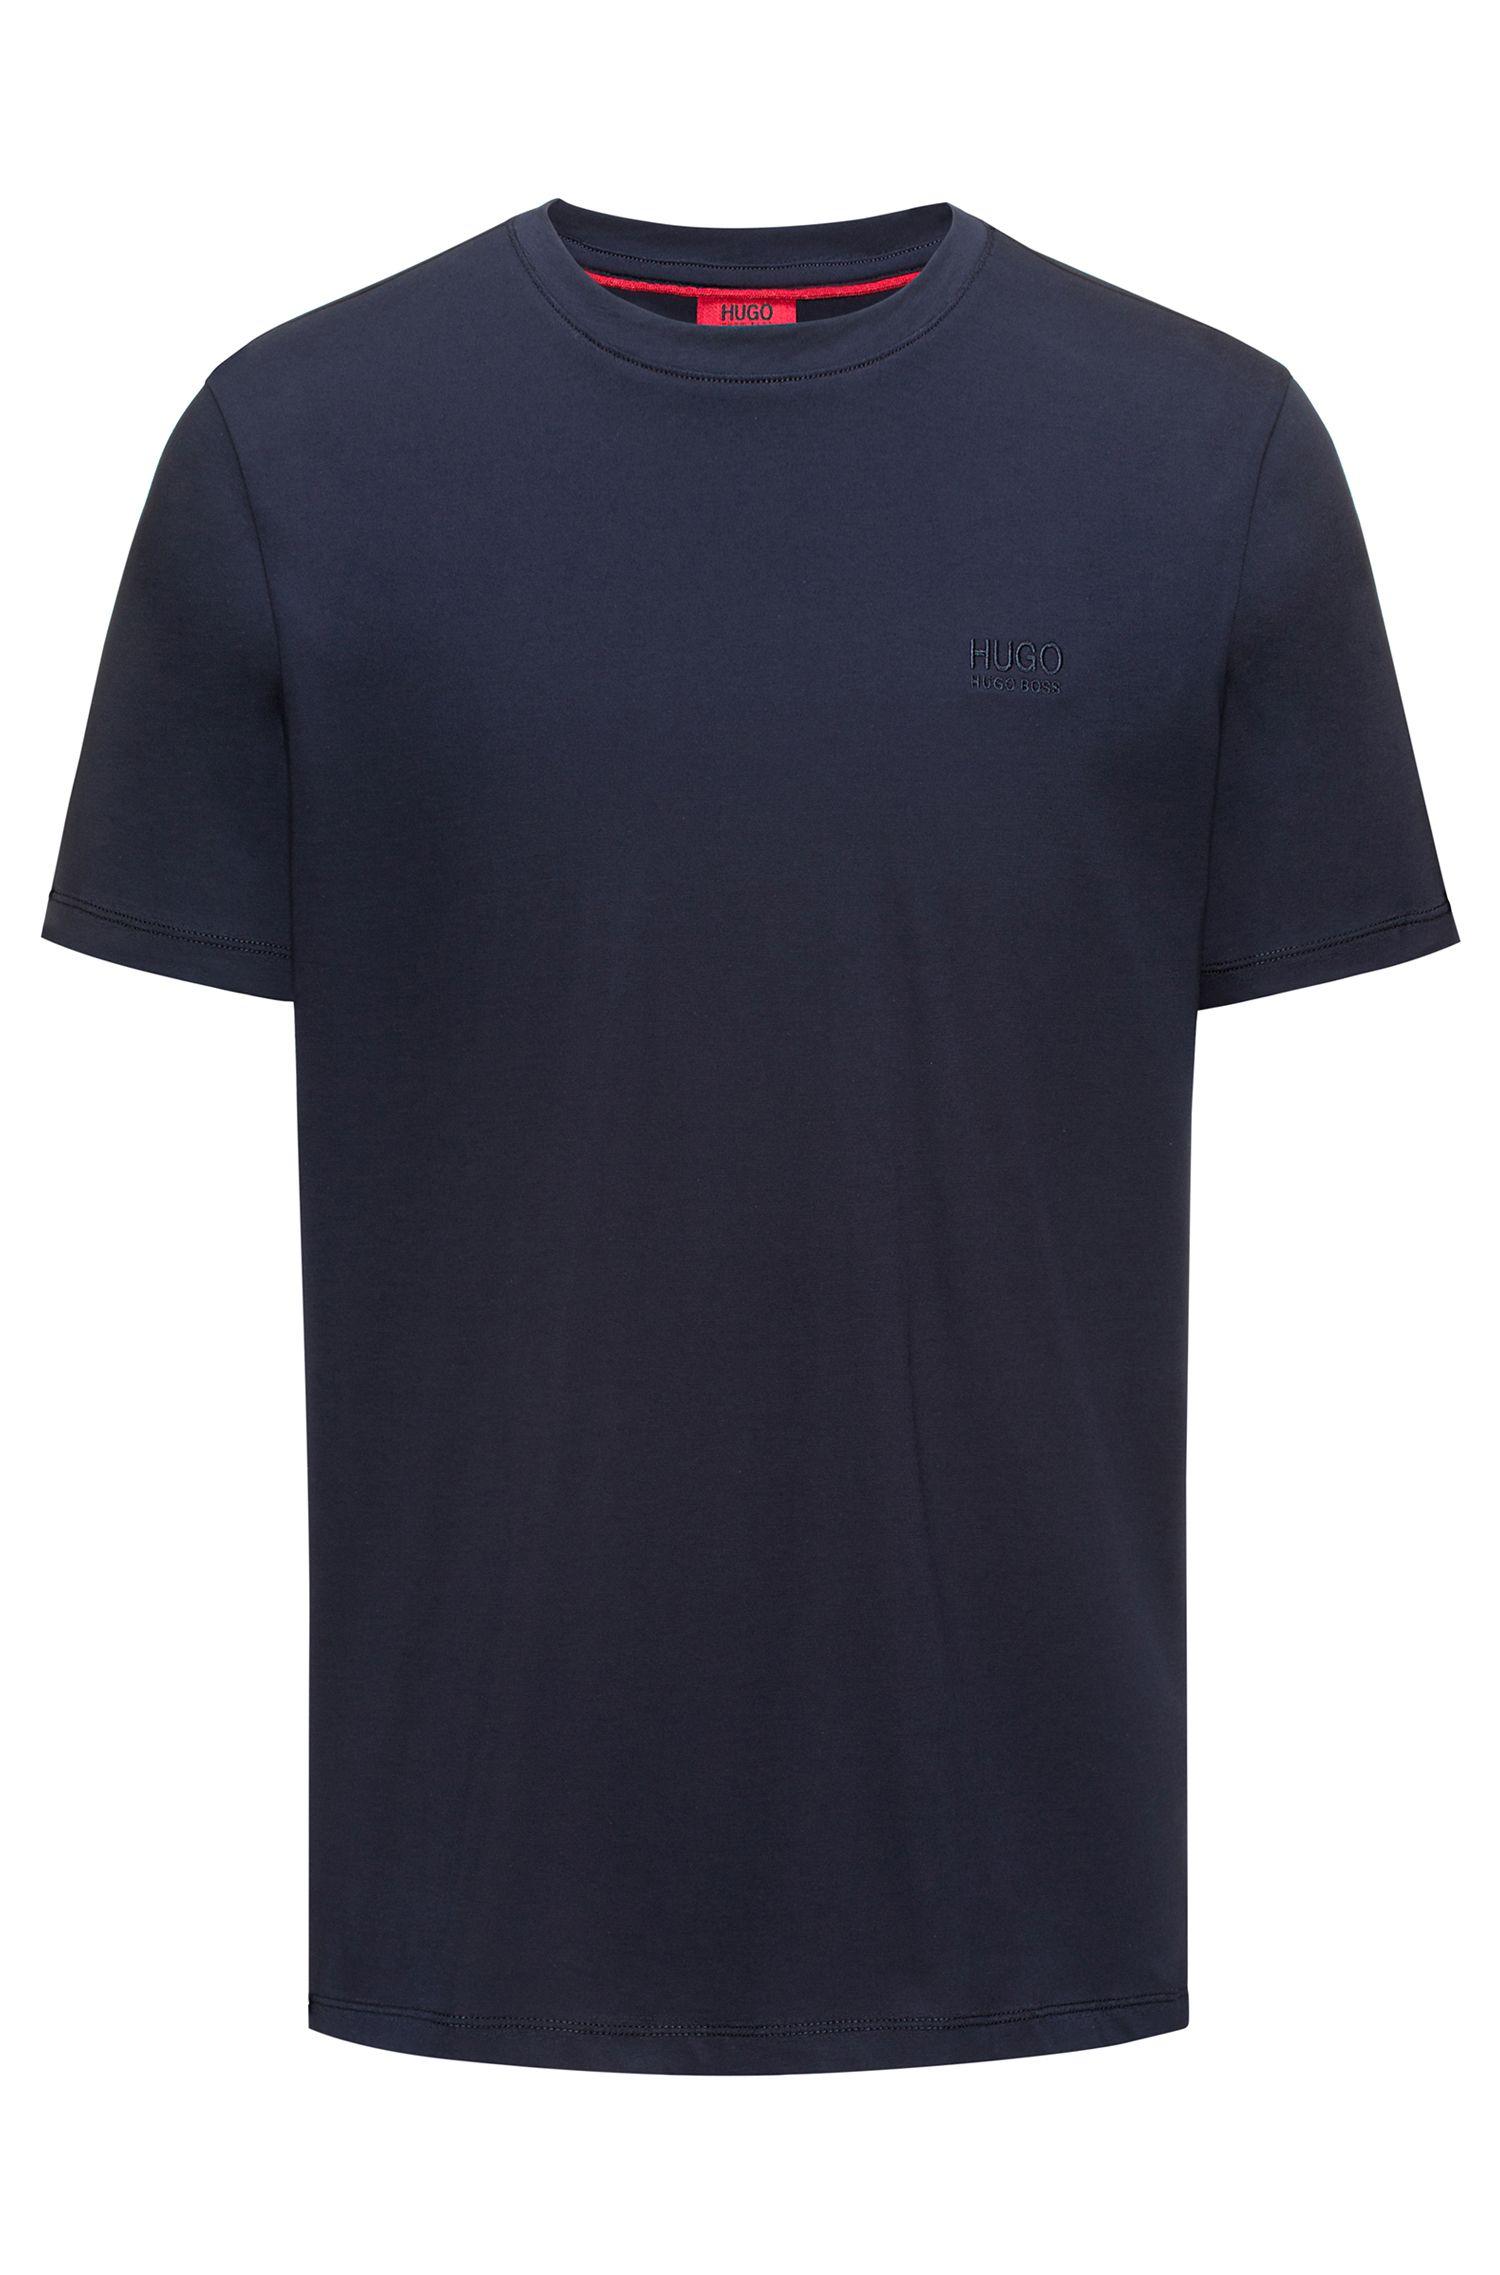 Regular-fit logo T-shirt in soft cotton